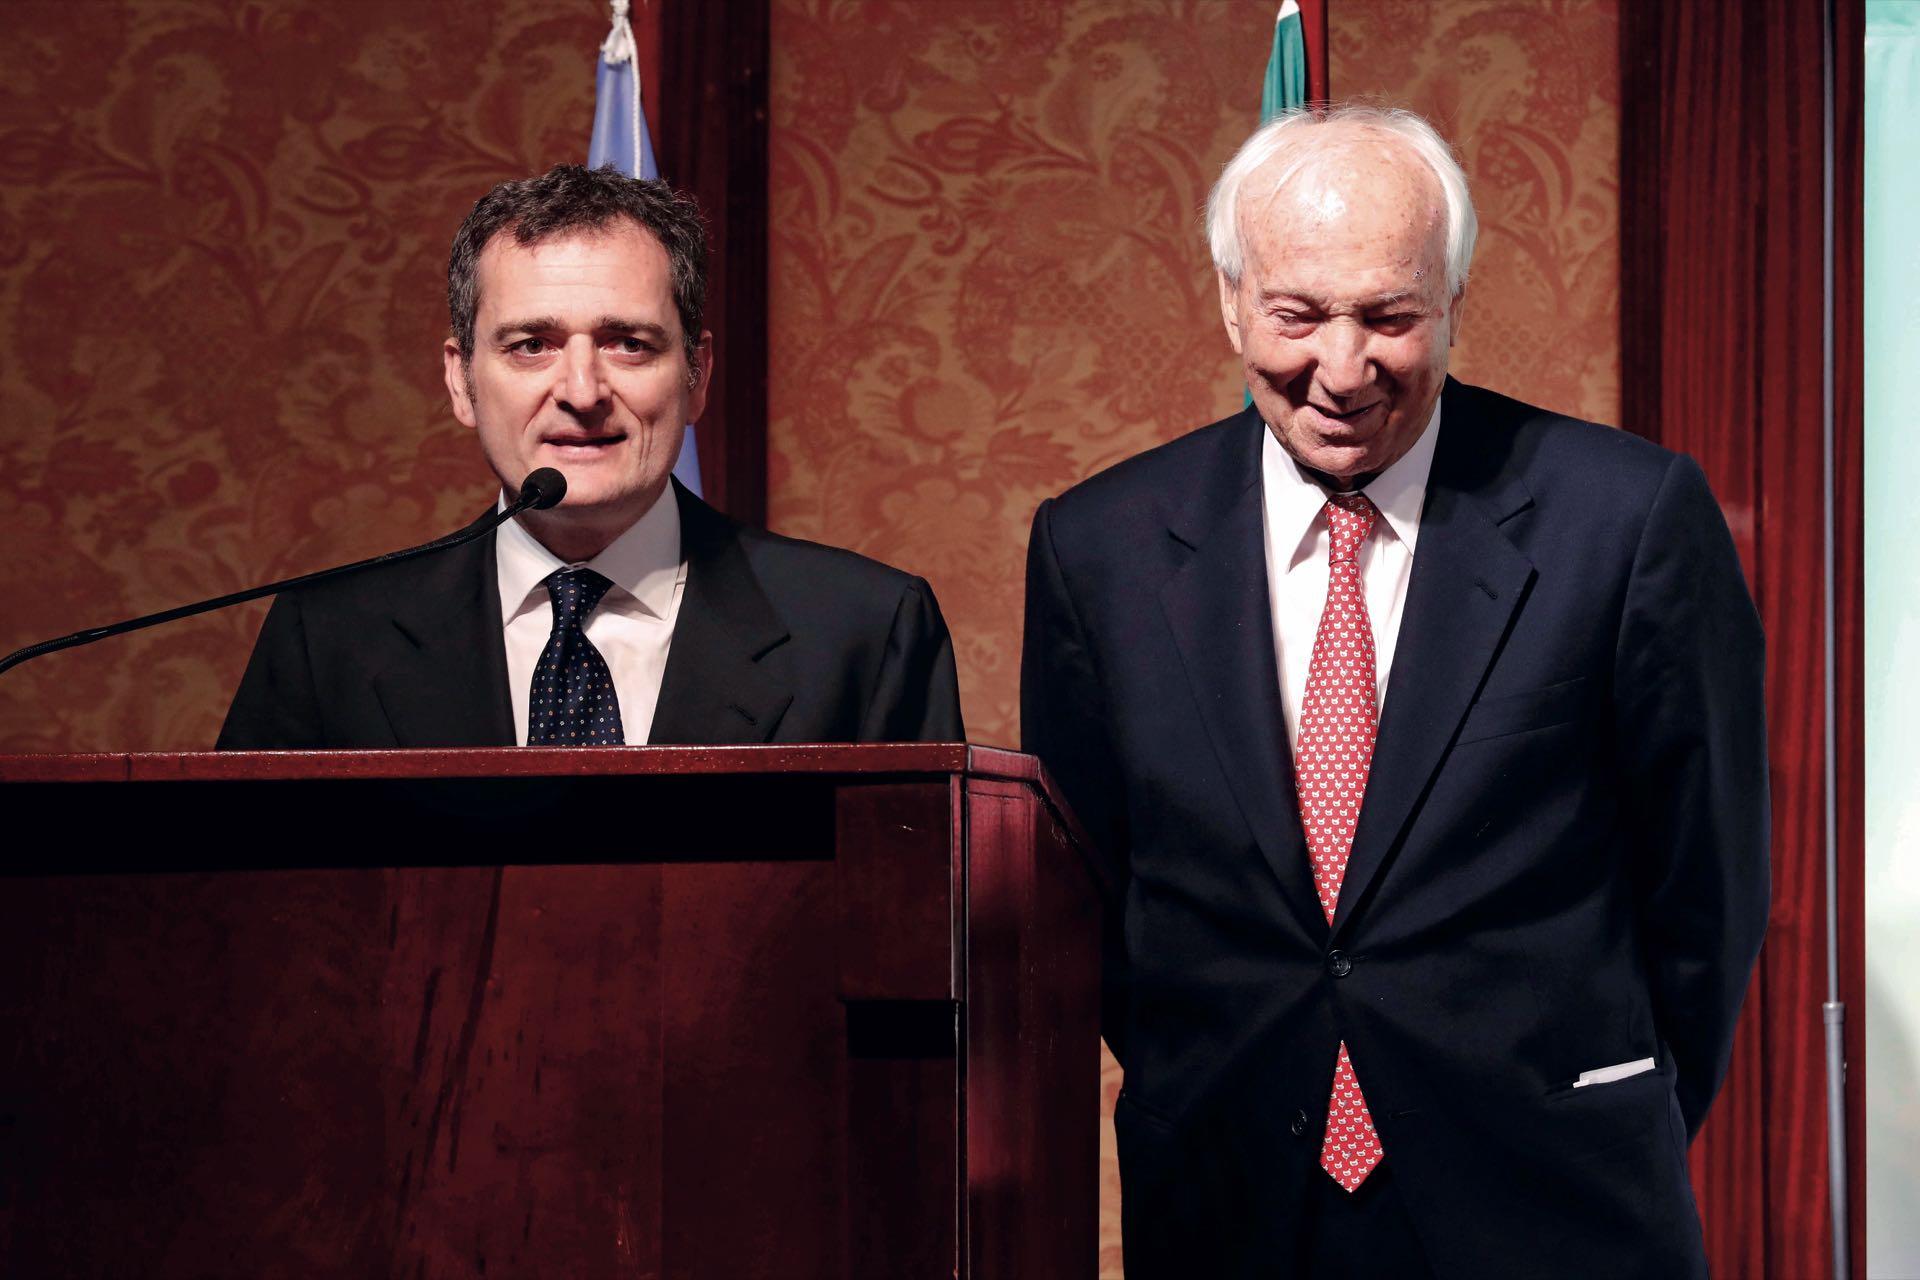 El cónsul Riccardo Smimmo, alma mater de la noche, al micrófono. Francisco Trombetta/GENTE